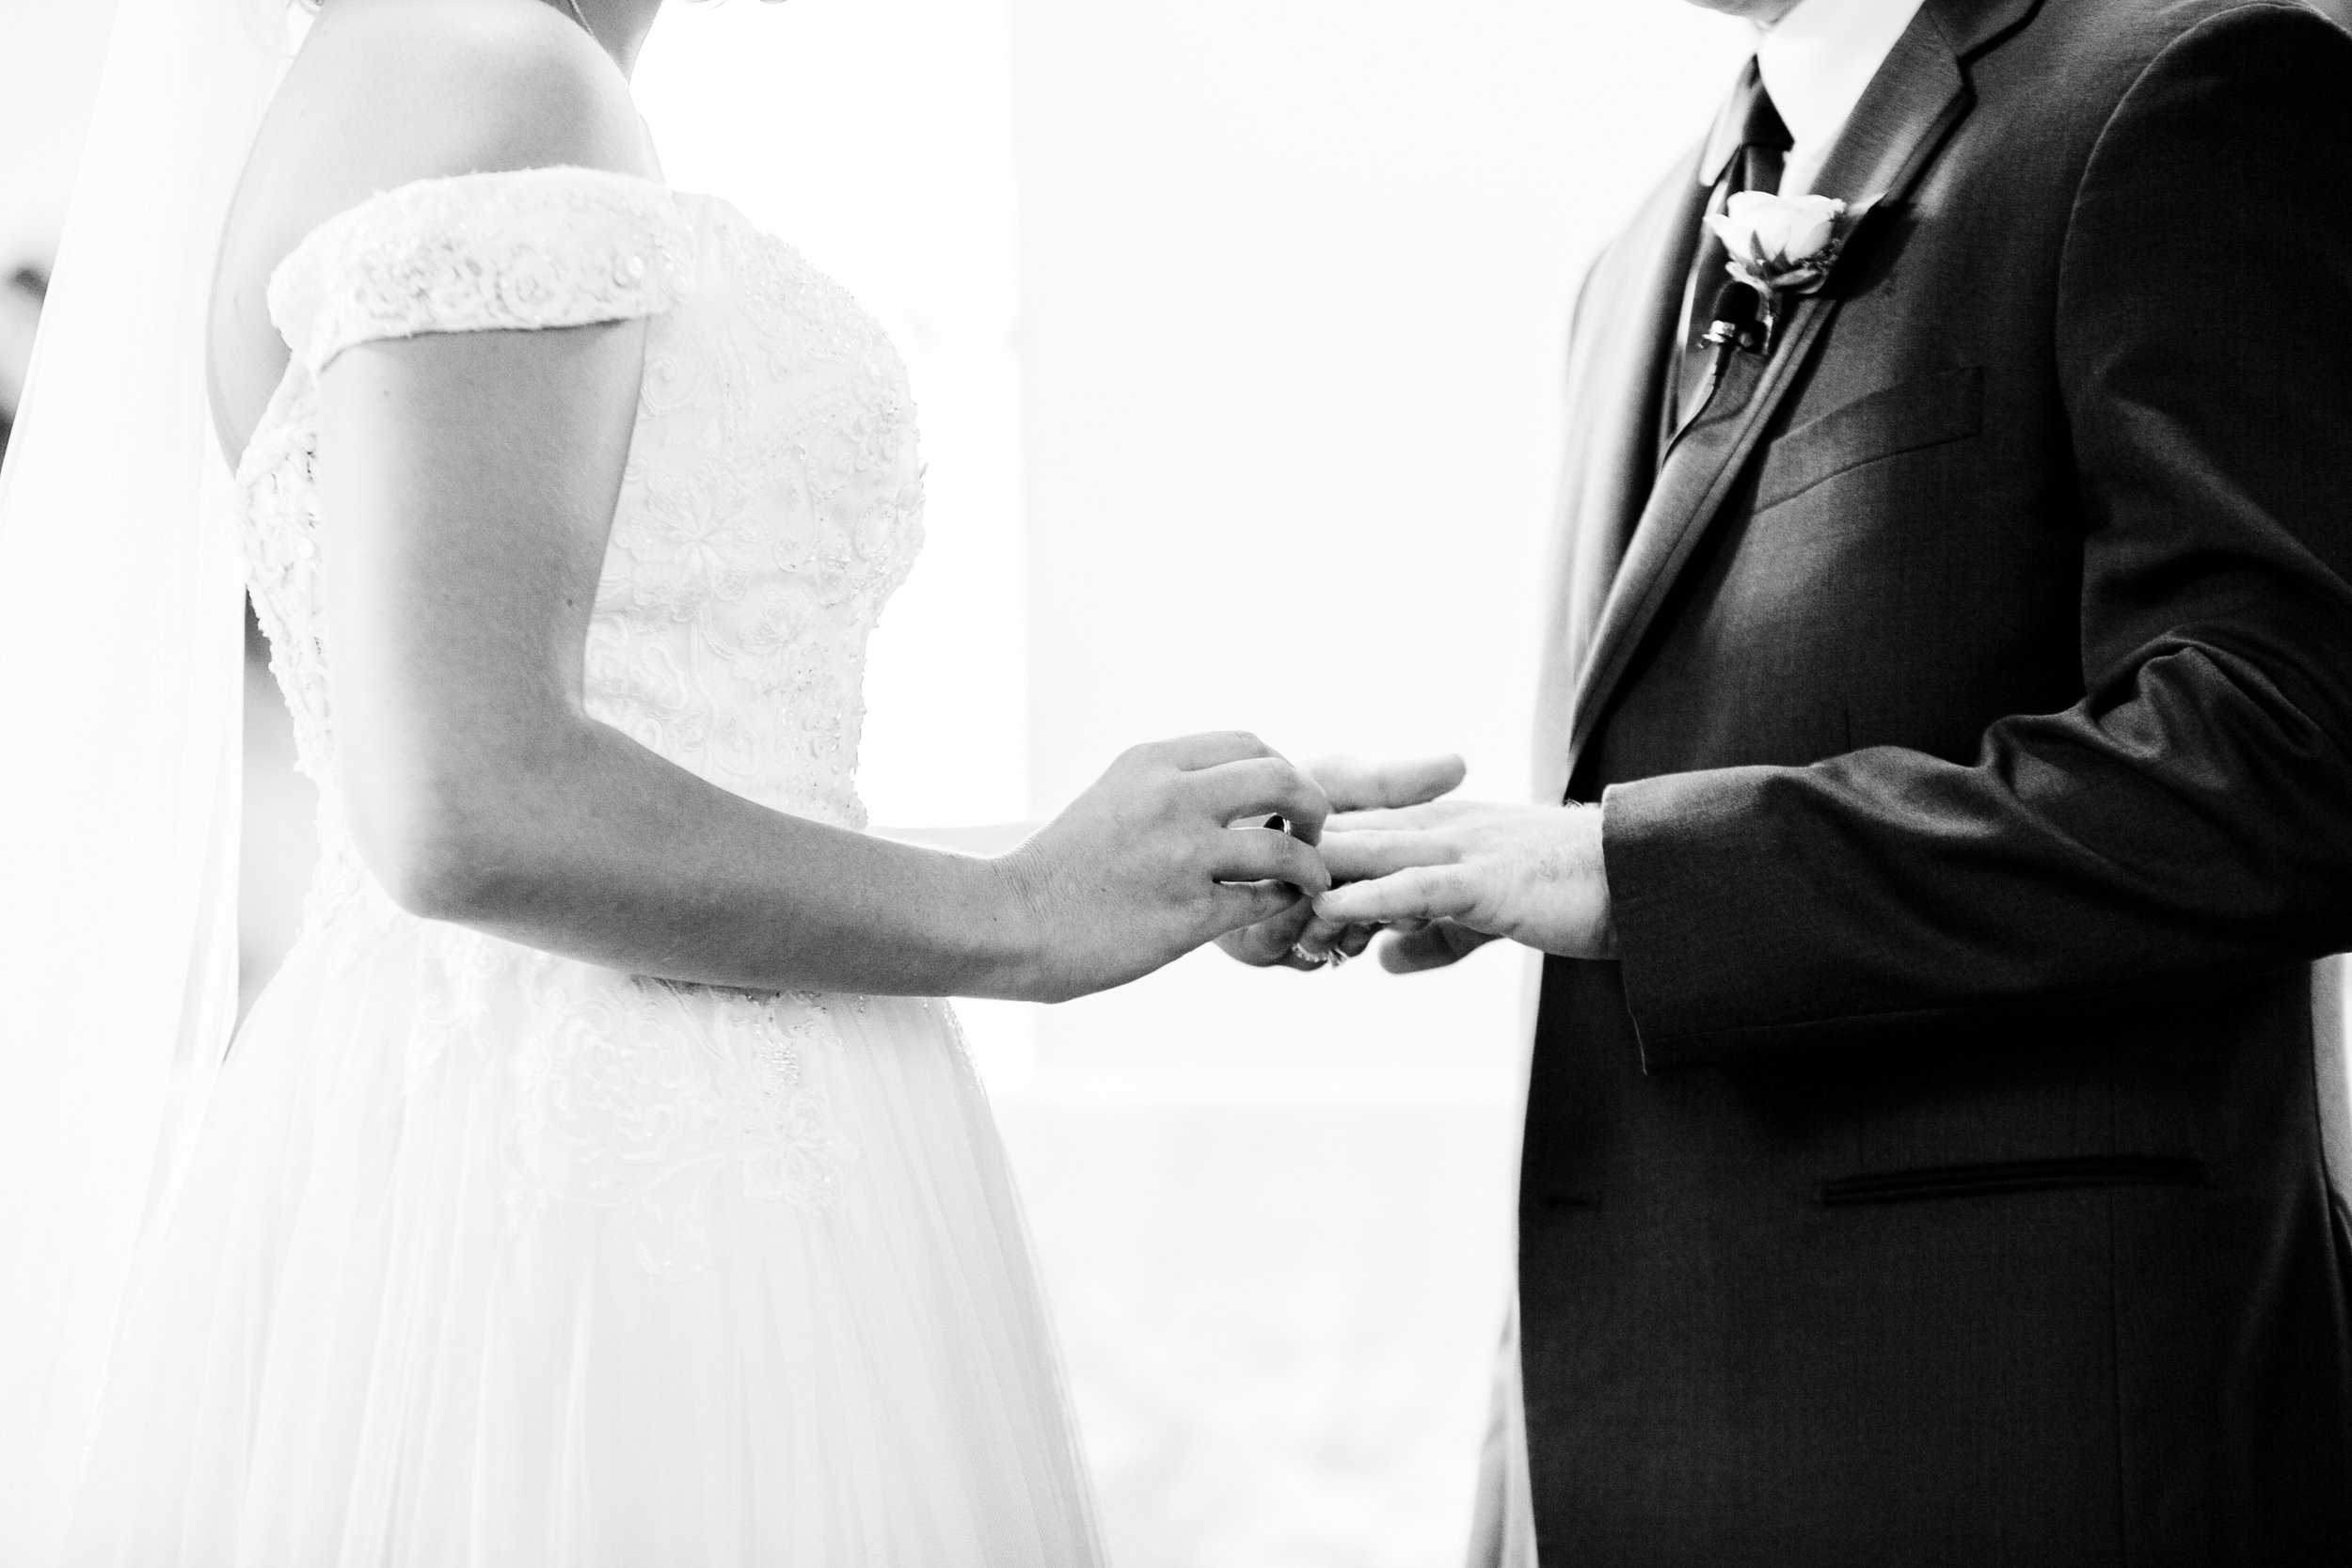 ICONA GOLDEN INN AVALON NJ WEDDING PHOTOGRAPHY  - 048.jpg